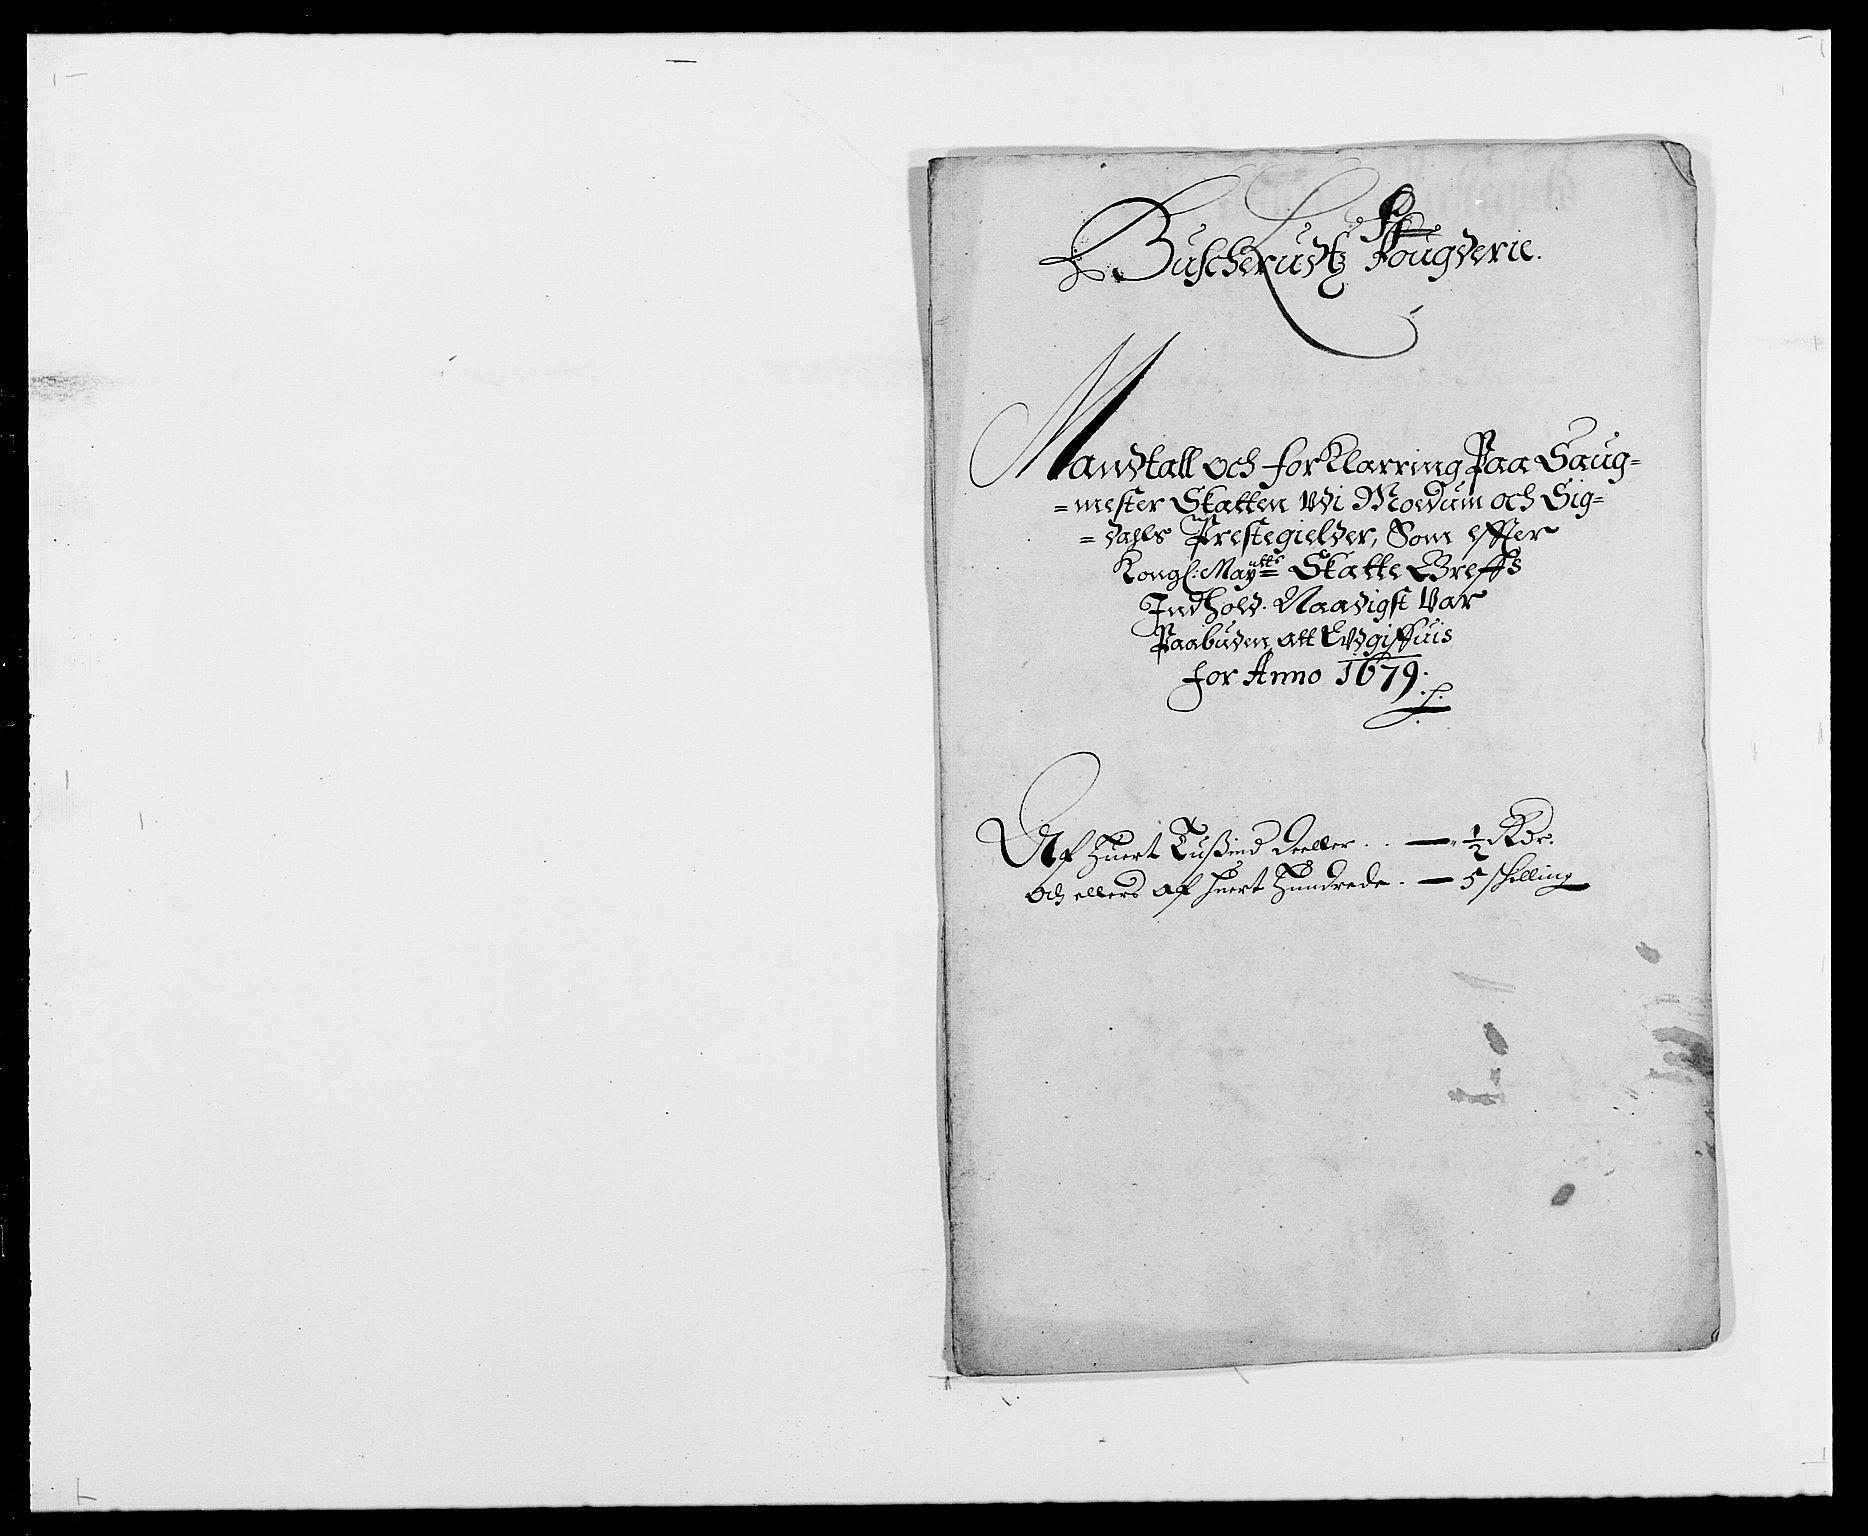 RA, Rentekammeret inntil 1814, Reviderte regnskaper, Fogderegnskap, R25/L1674: Fogderegnskap Buskerud, 1678-1681, s. 324